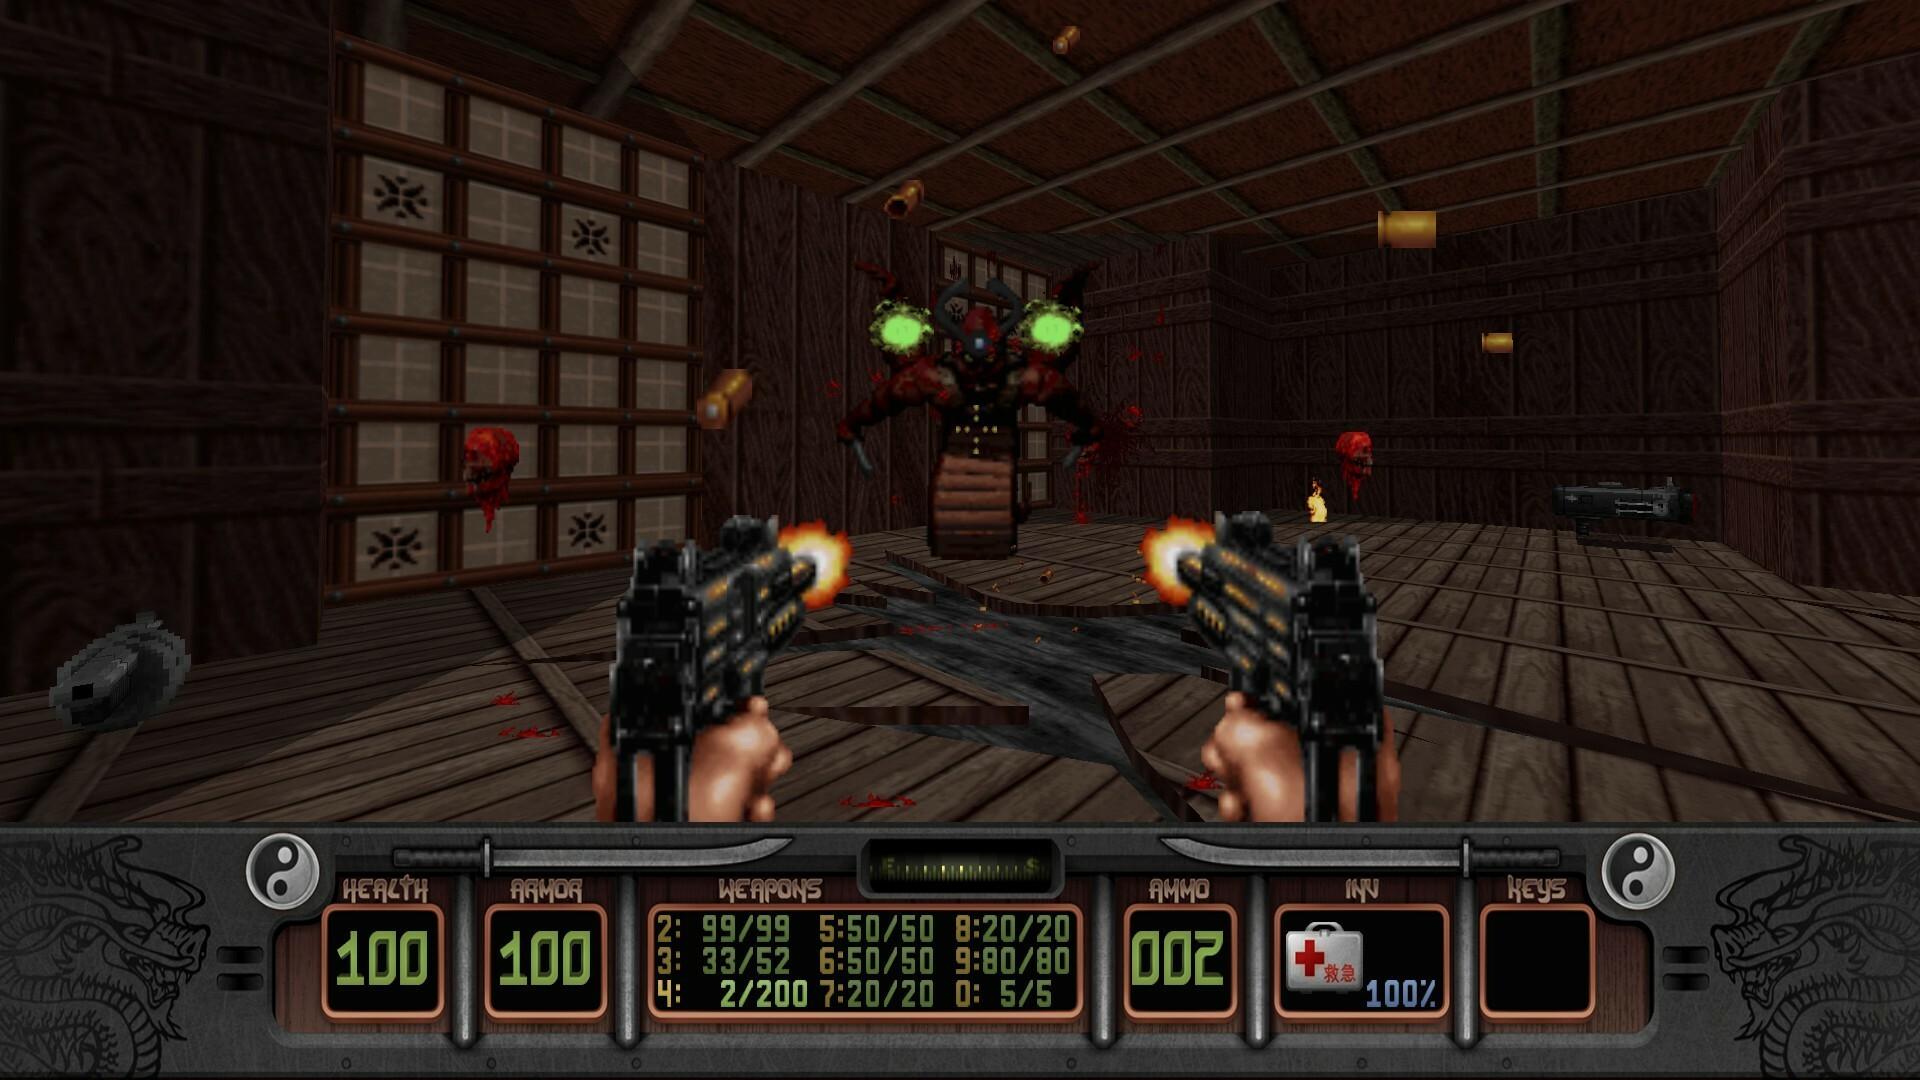 shadow-warrior-classic-redux-pc-screenshot-2